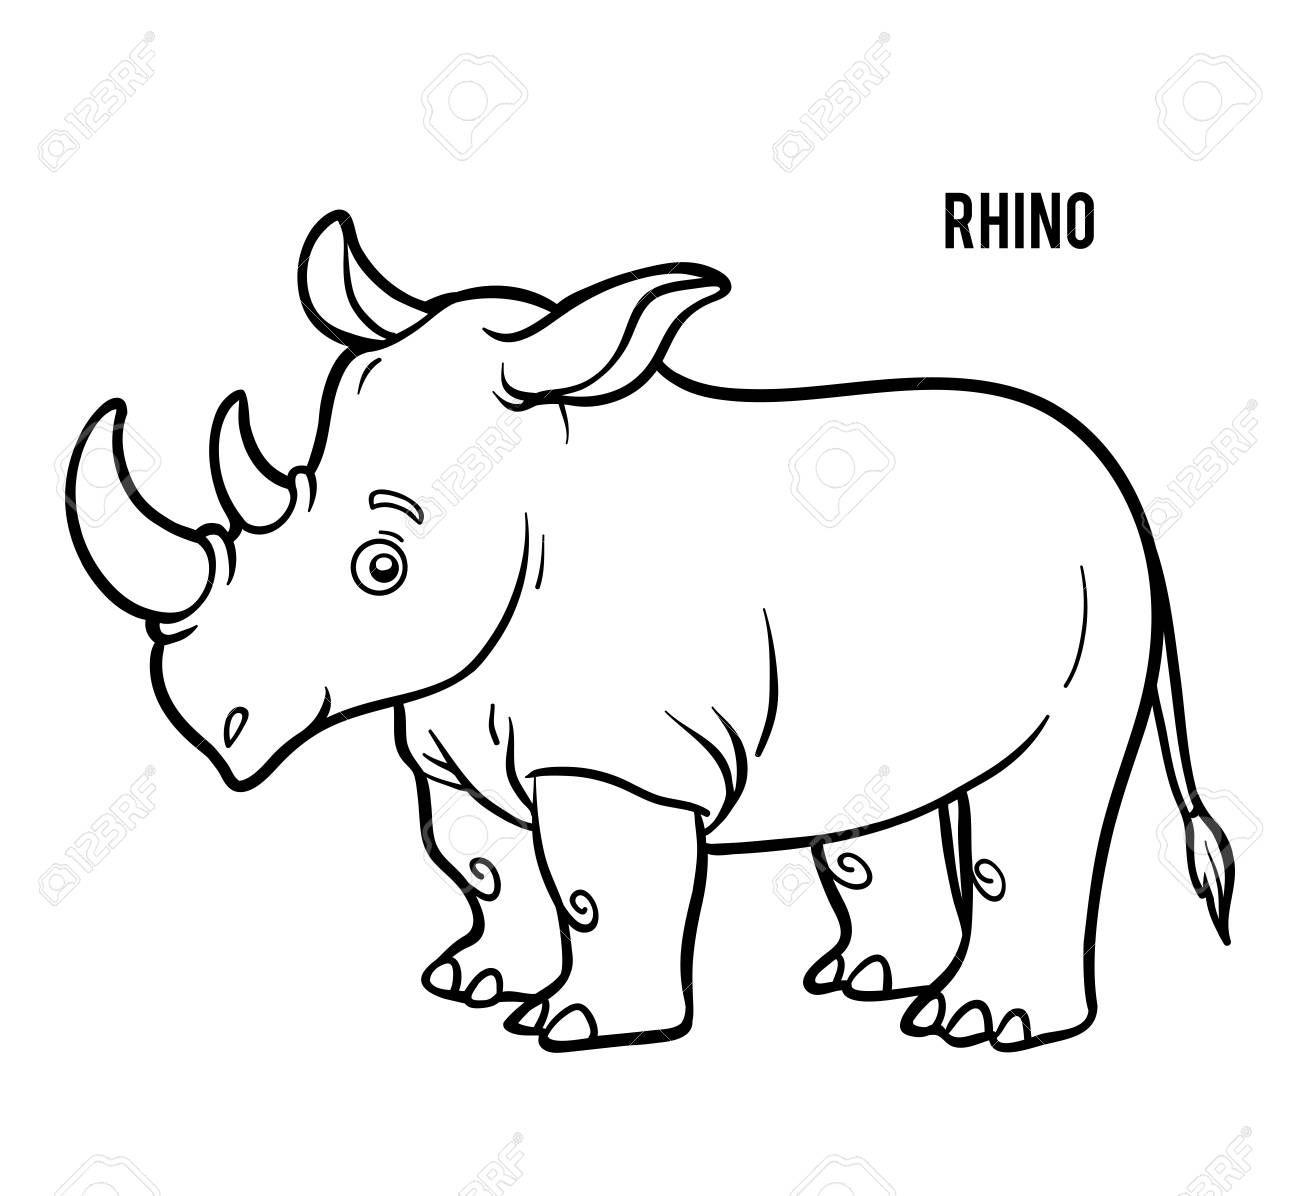 Coloring Book For Children Rhino Sponsored Book Coloring Rhino Children Coloring Books Technology Logo Logo Design